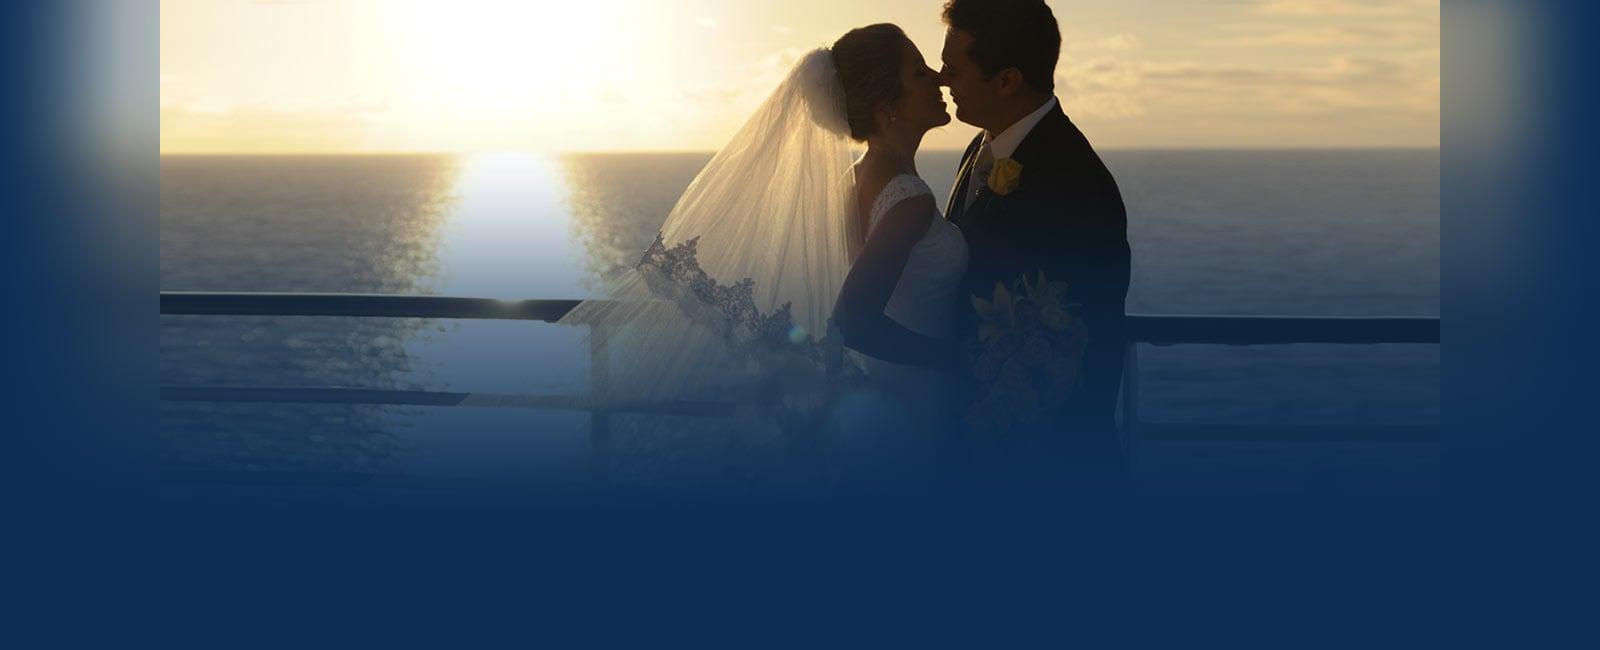 Wedding Cruise During Sunset